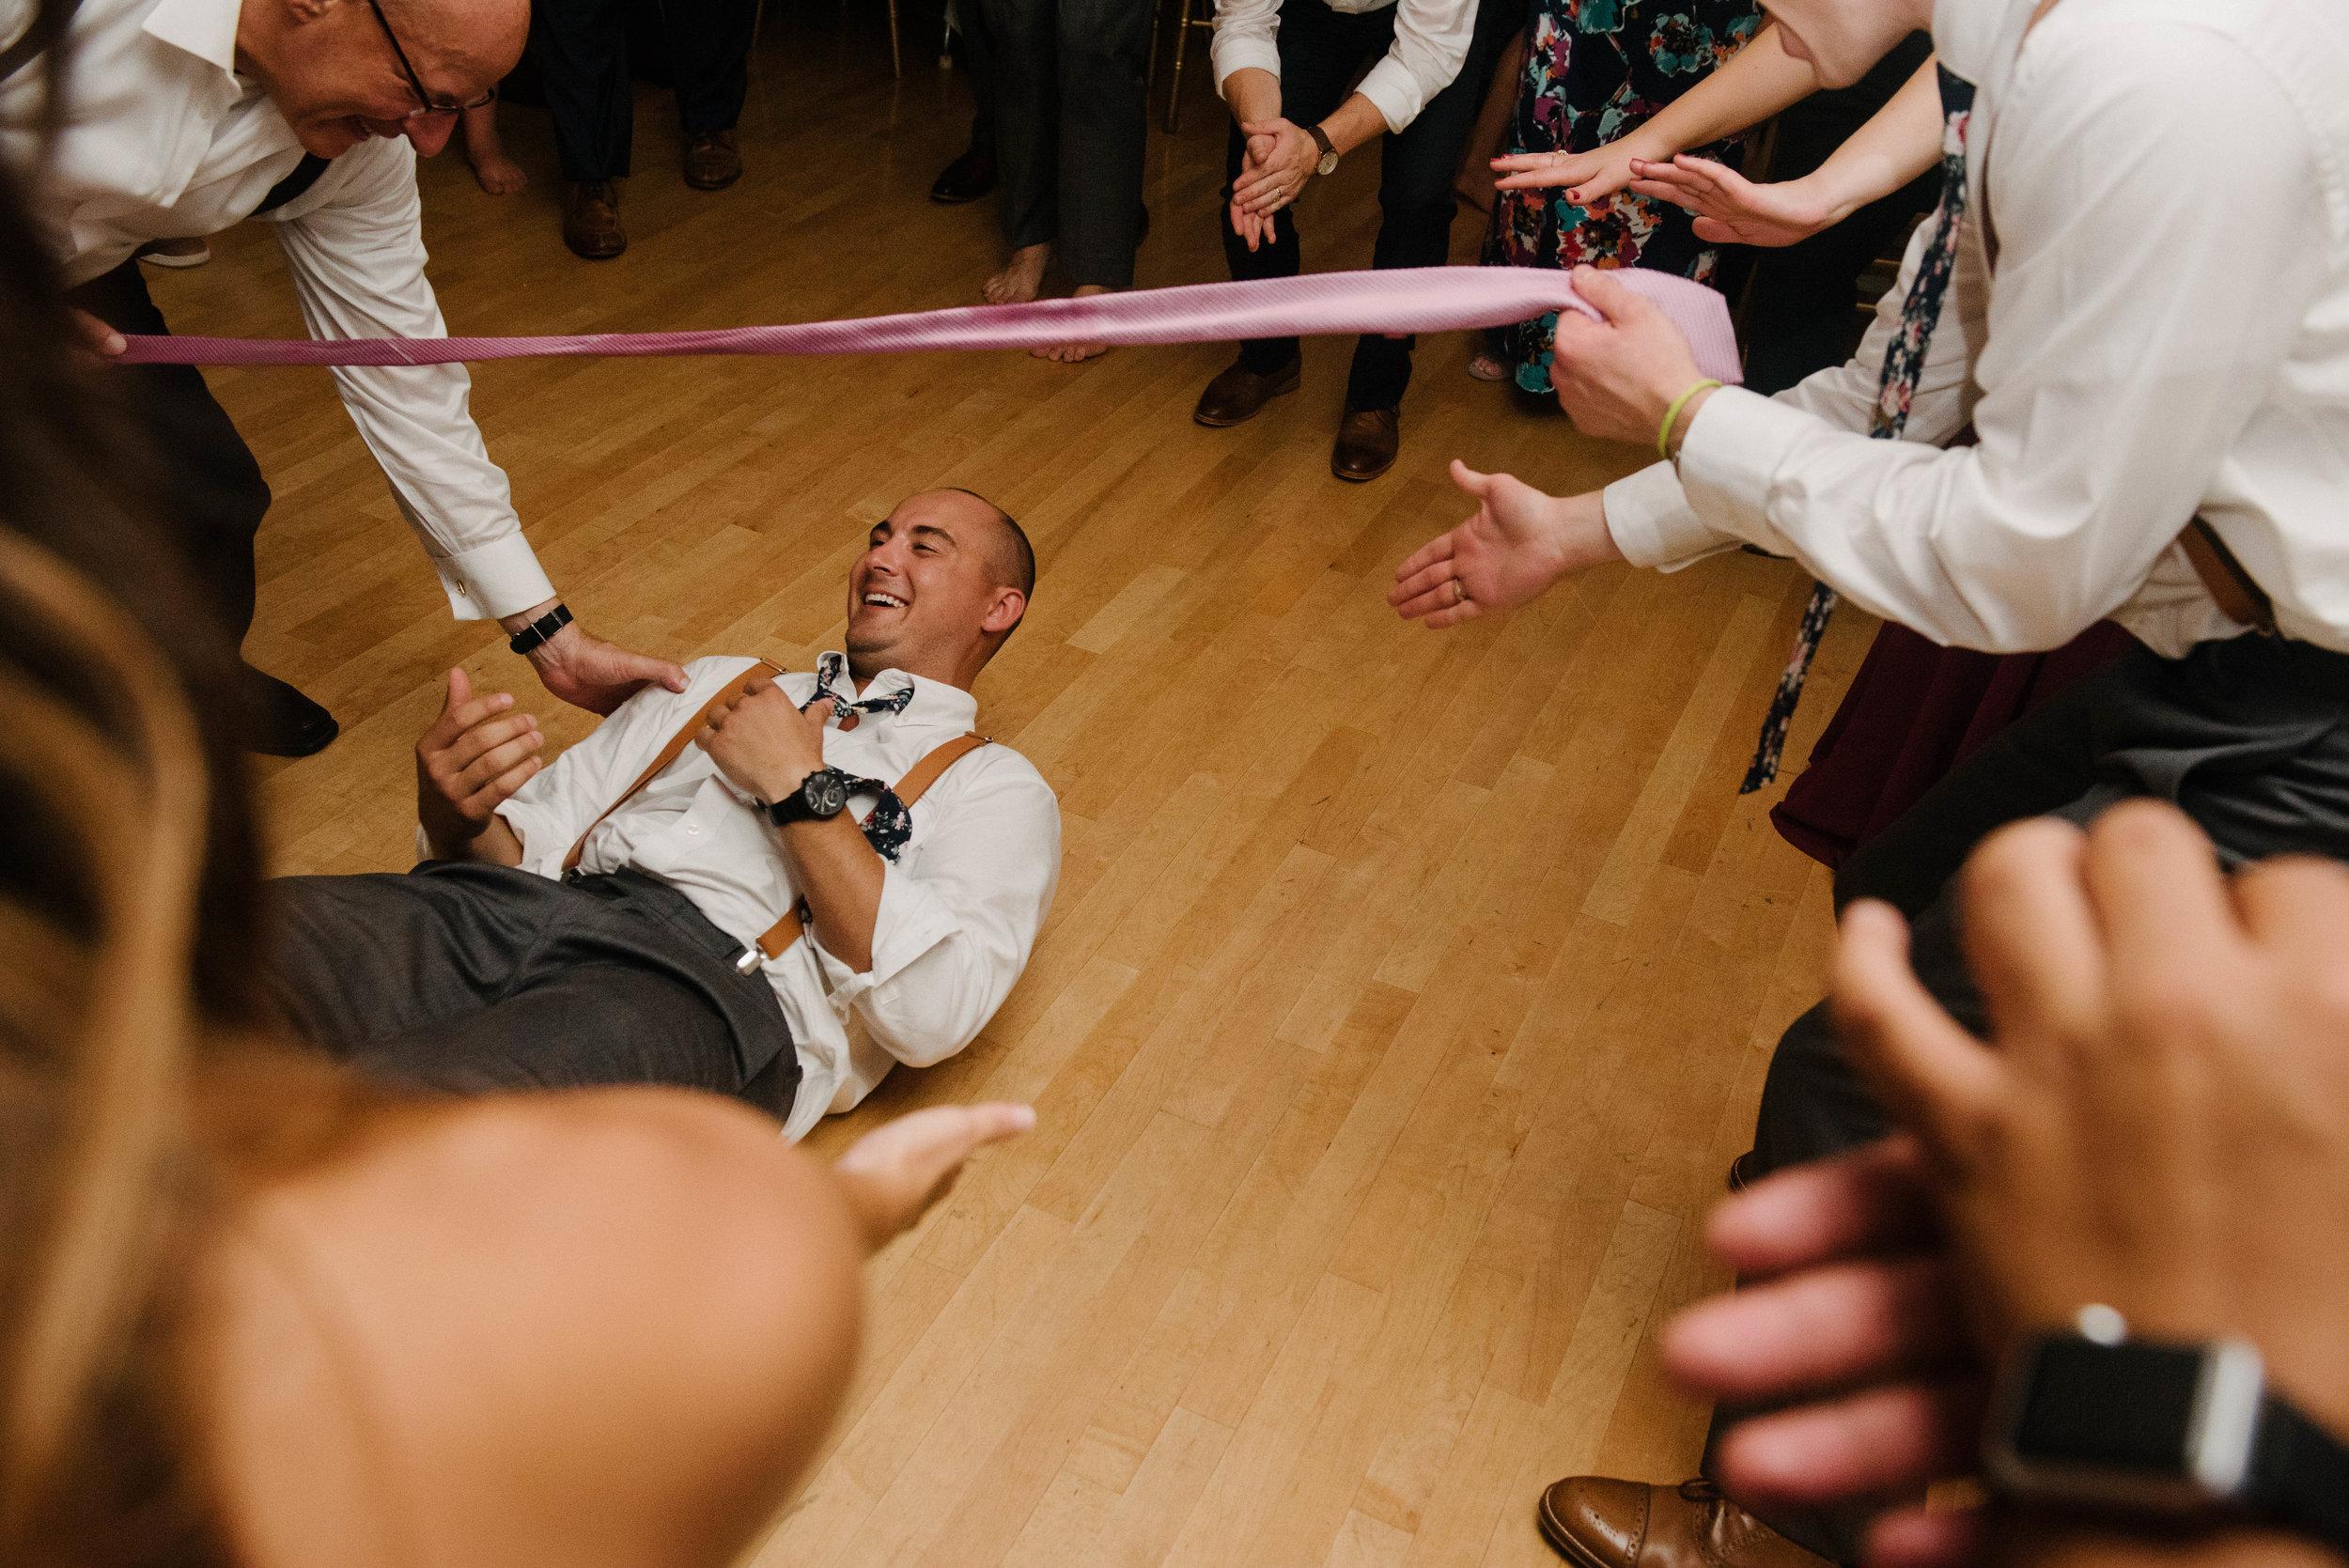 78_north shore boston wedding photographer fifty one hale photography.jpg